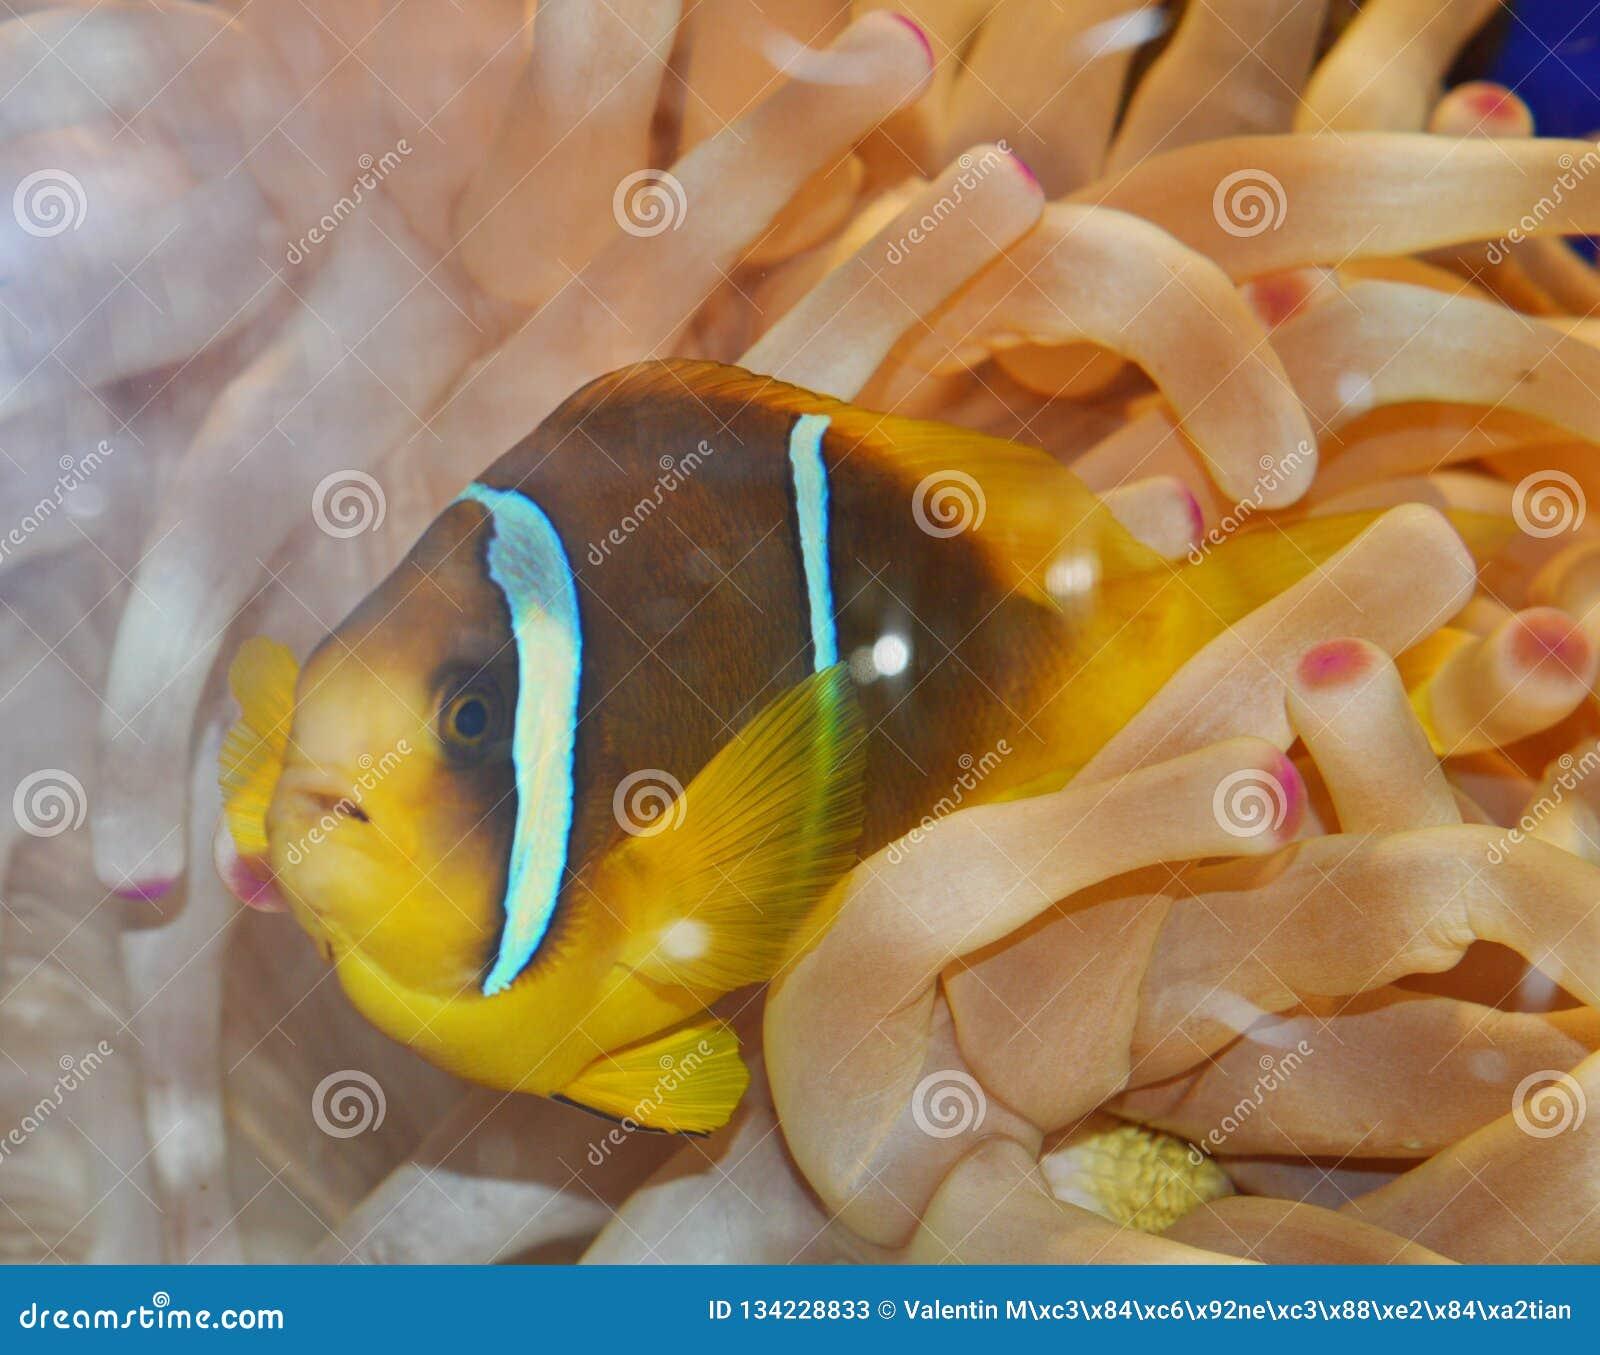 Clown Fish swimming in anemone